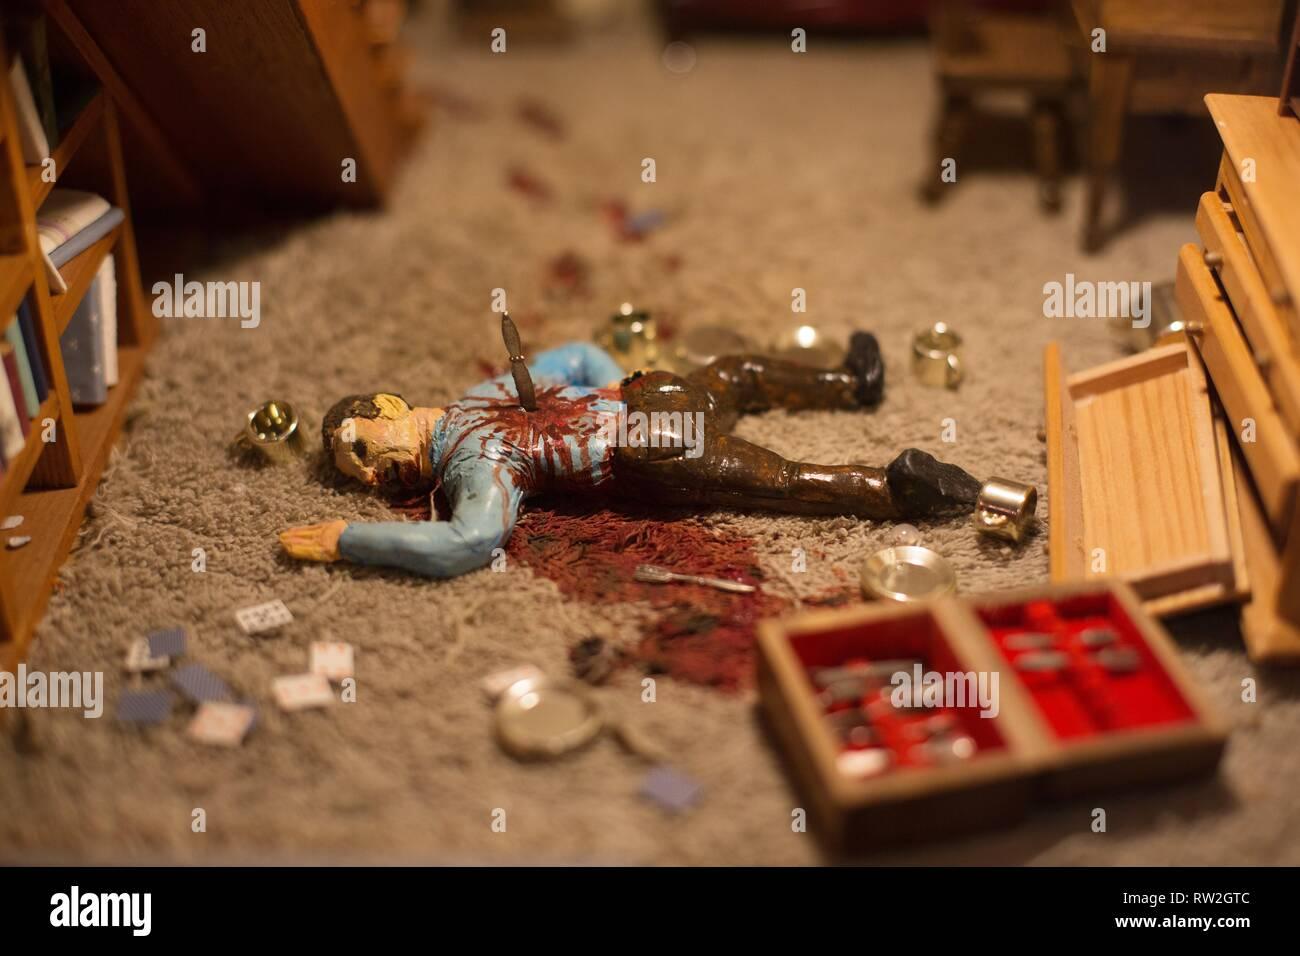 Close up detail of a diorama of a murder scene, at the Peculiarium in Portland, Oregon, USA. - Stock Image